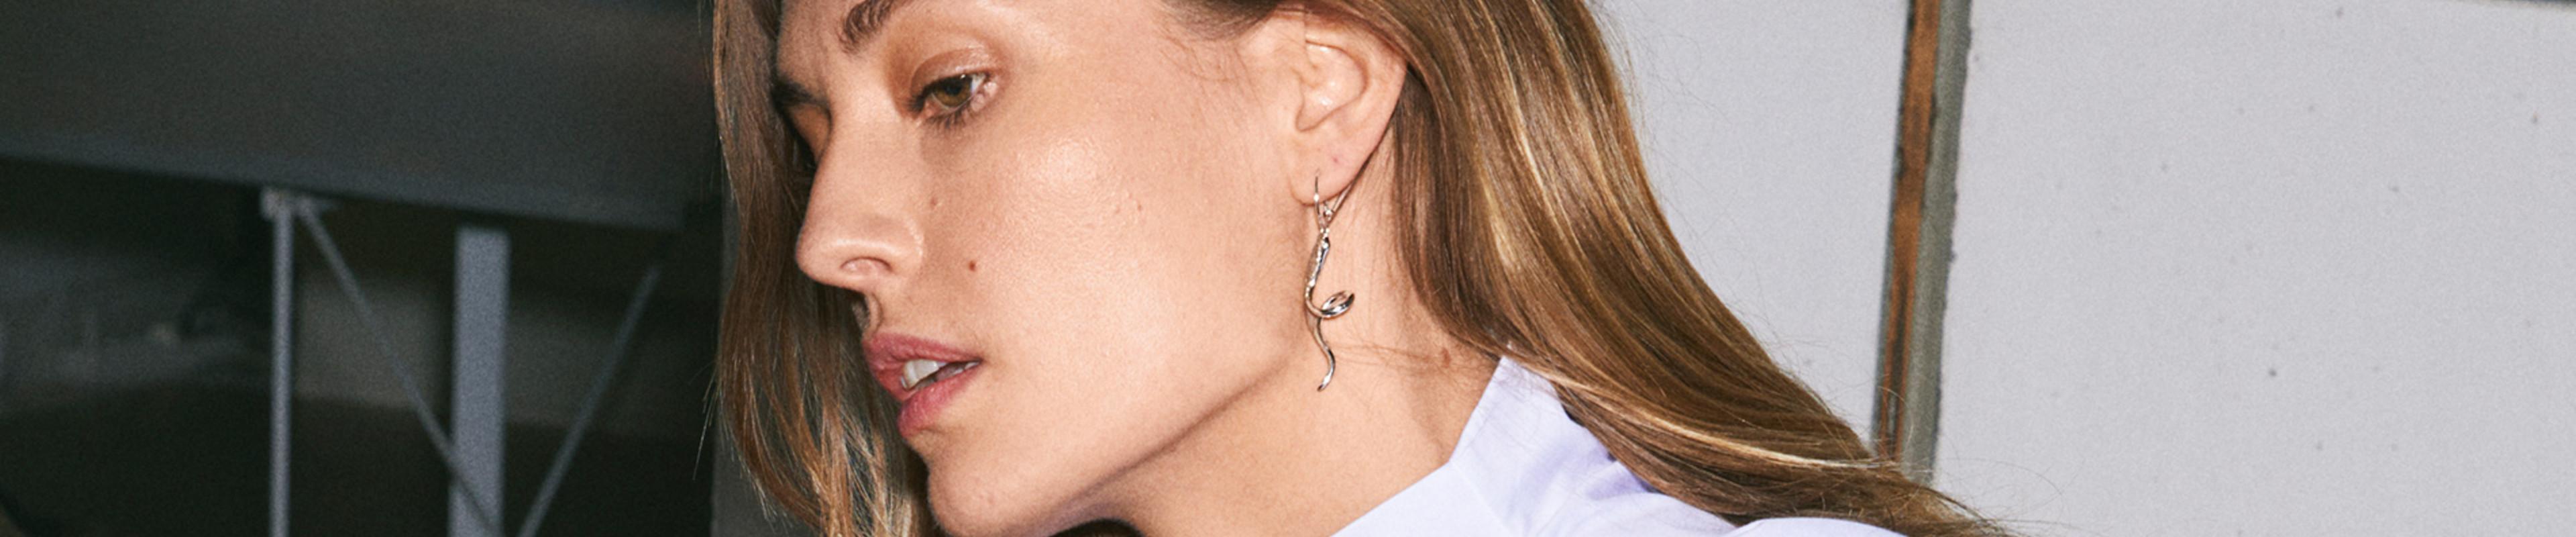 Boucles d'oreilles audacieuses